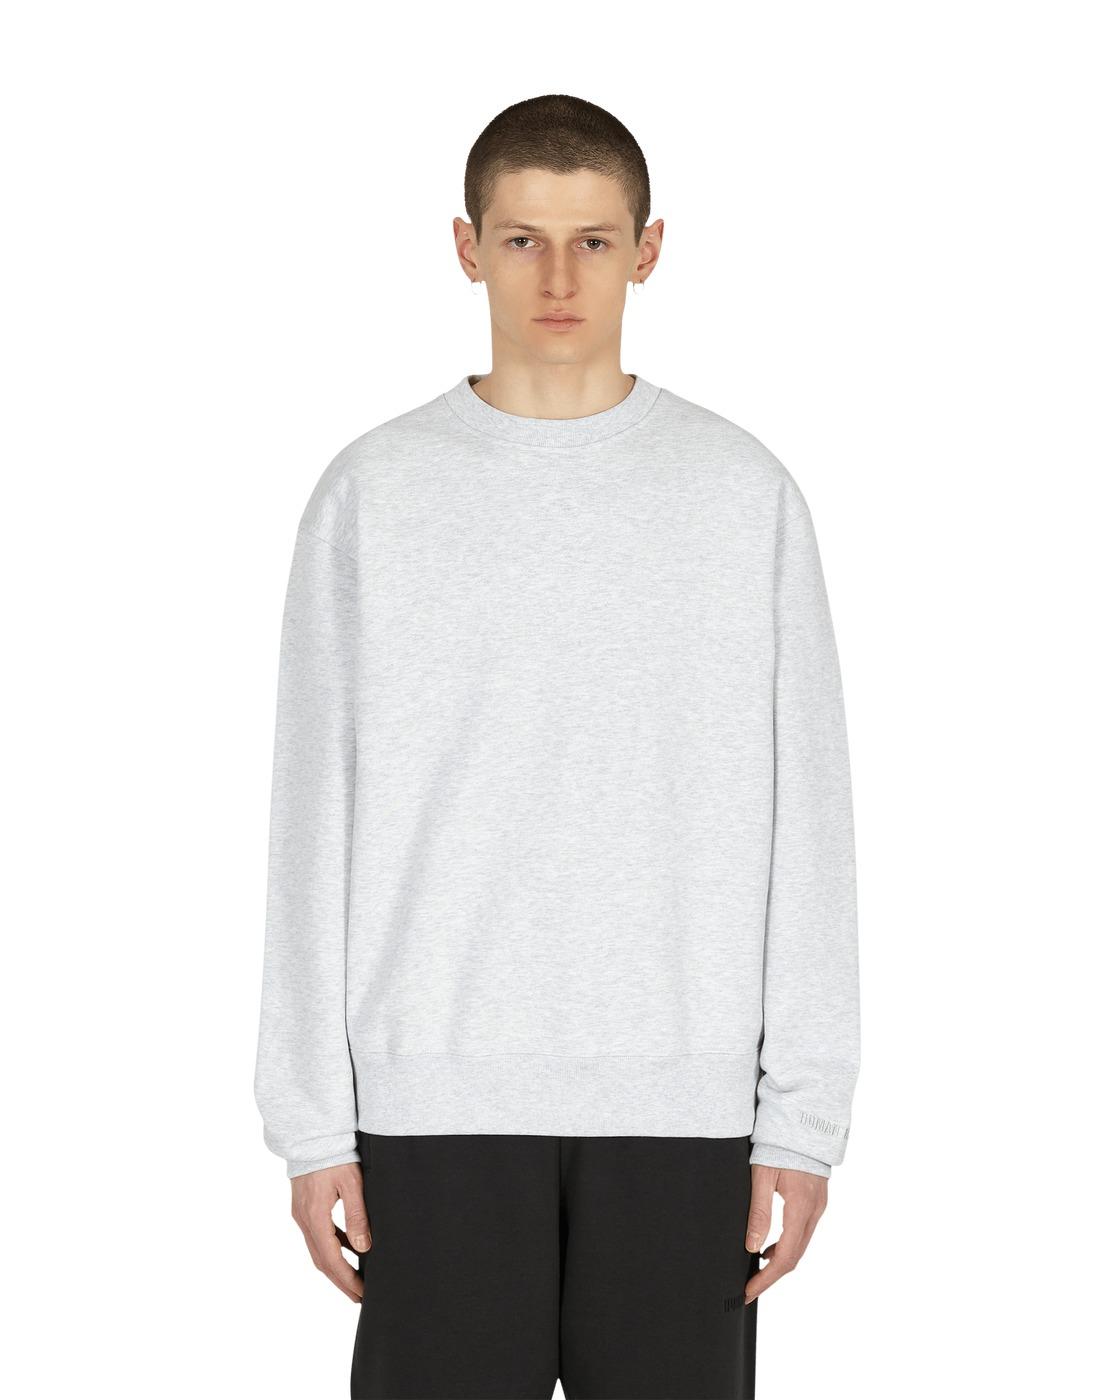 Photo: Adidas Originals Pharrell Williams Basics Crewneck Sweatshirt Lgh